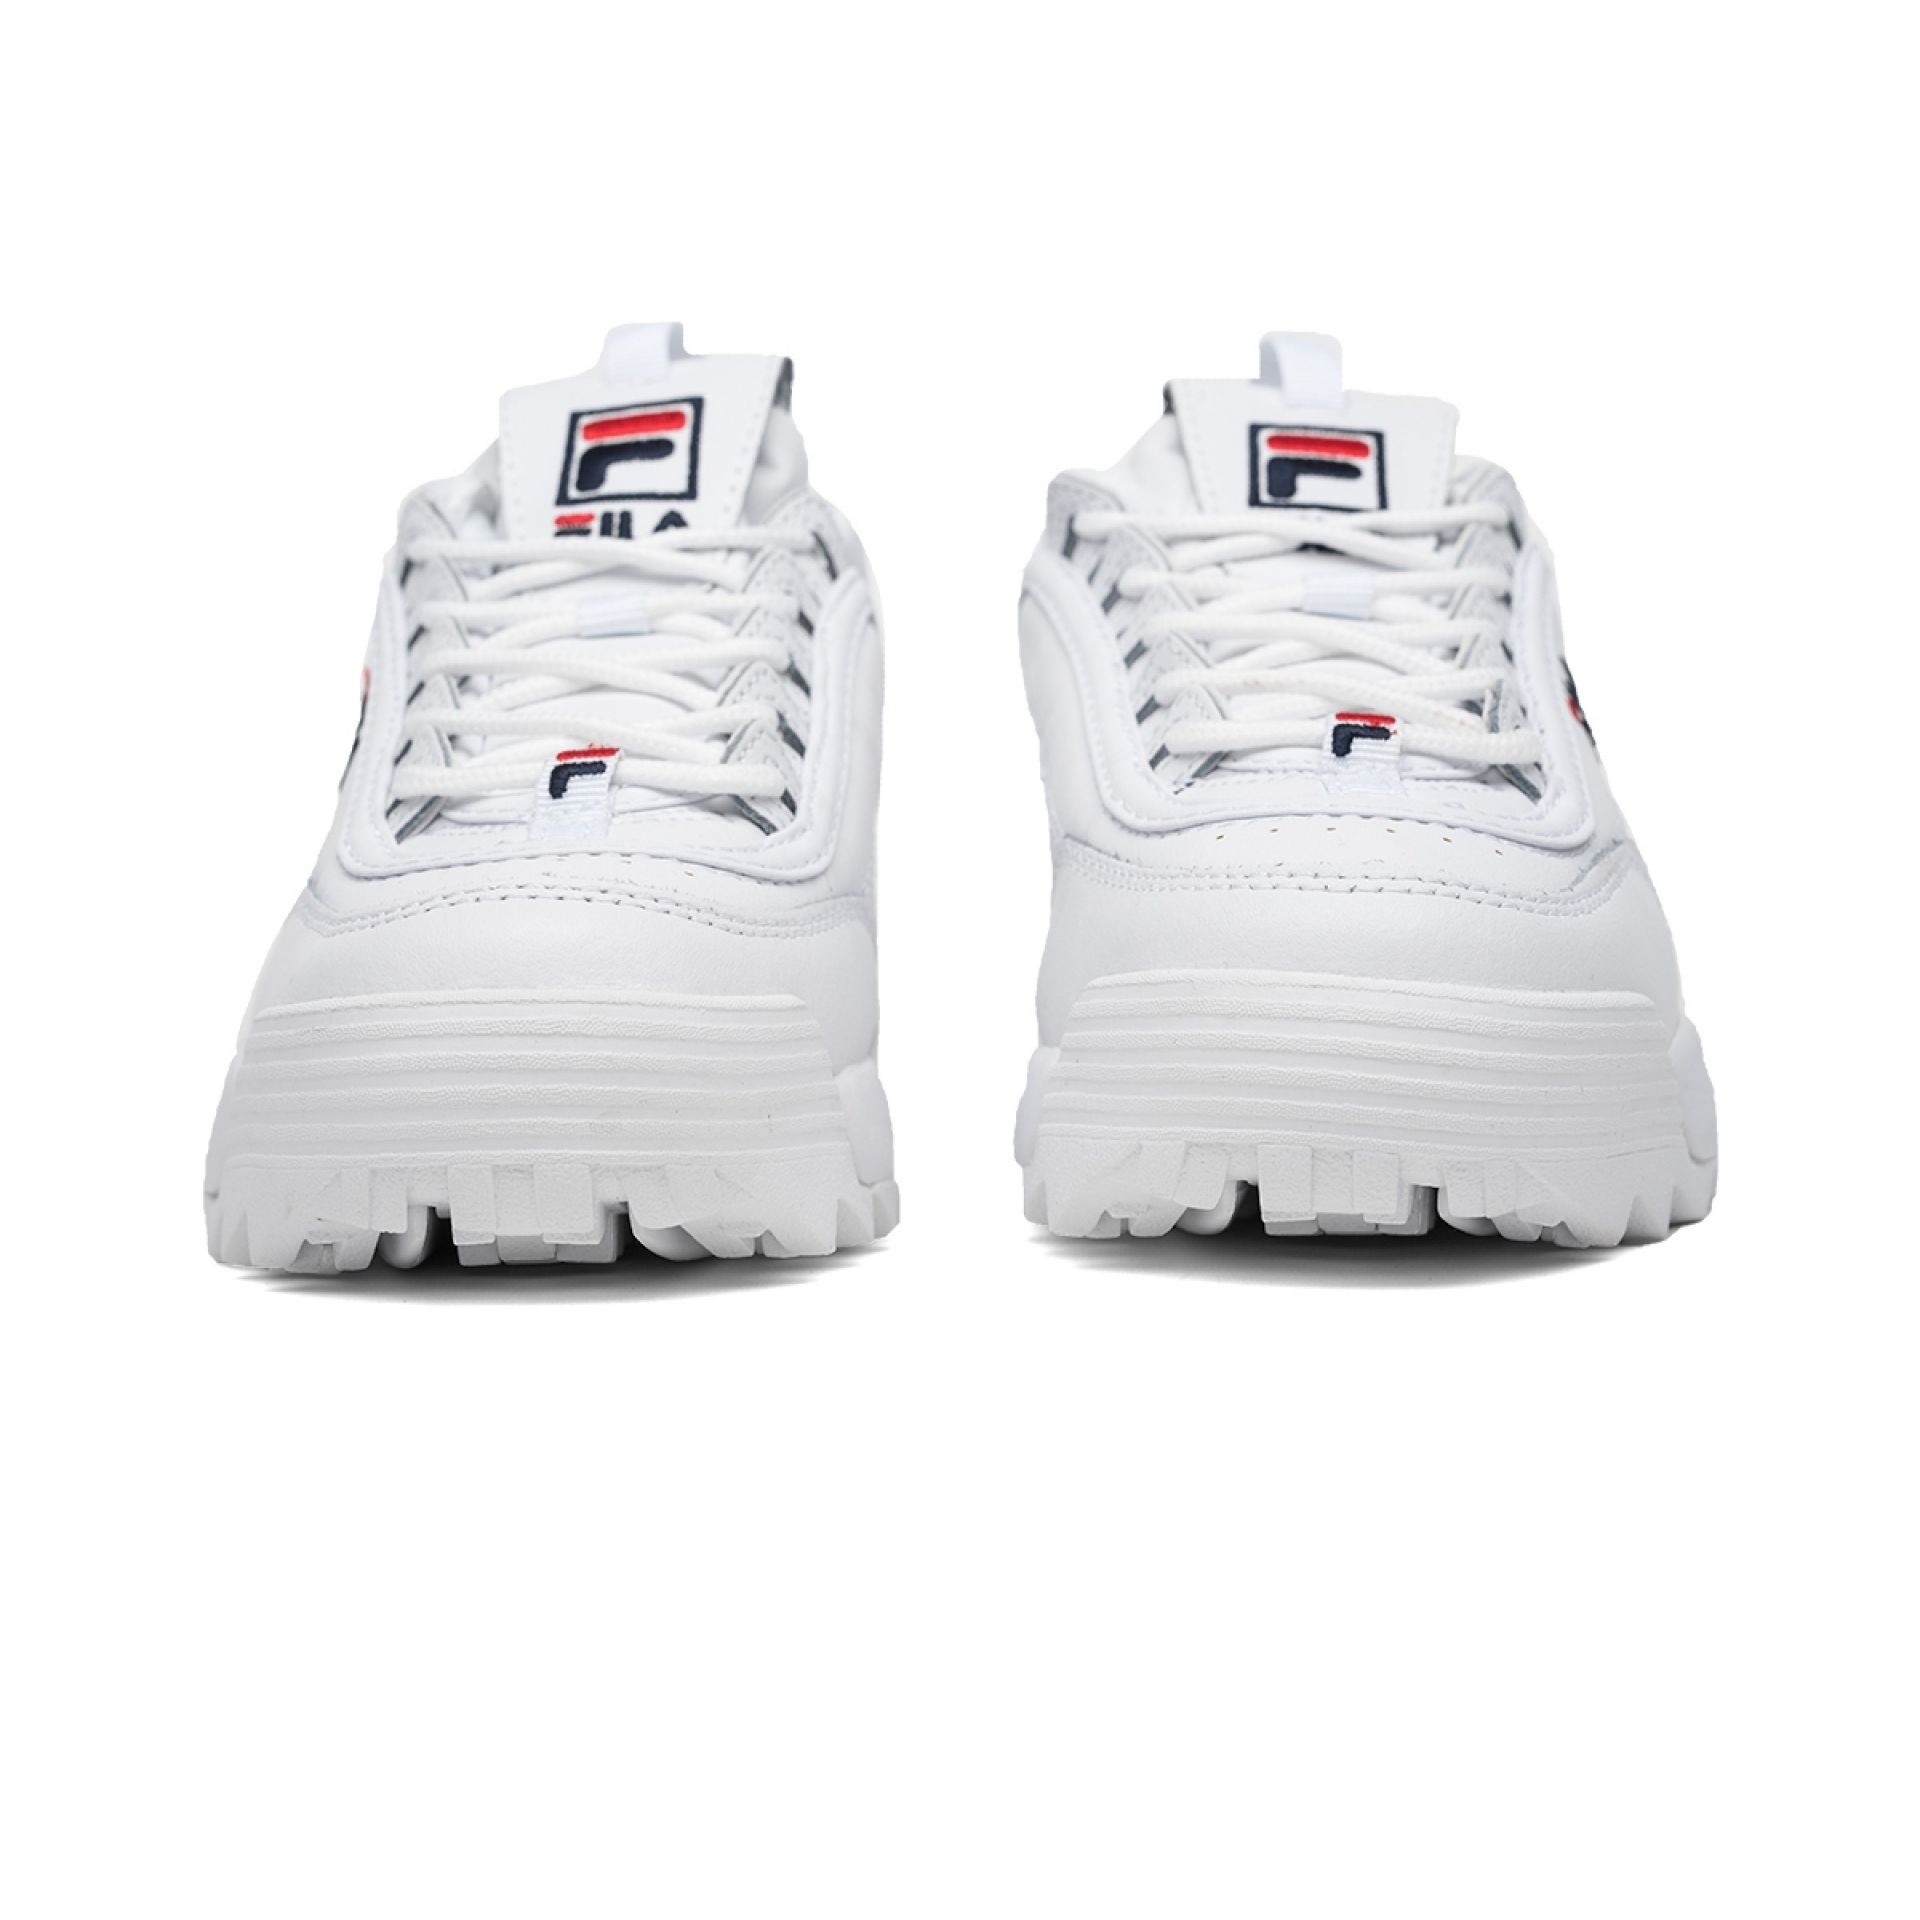 Fila Disruptor II Premium - My Sneaker d854453b51d